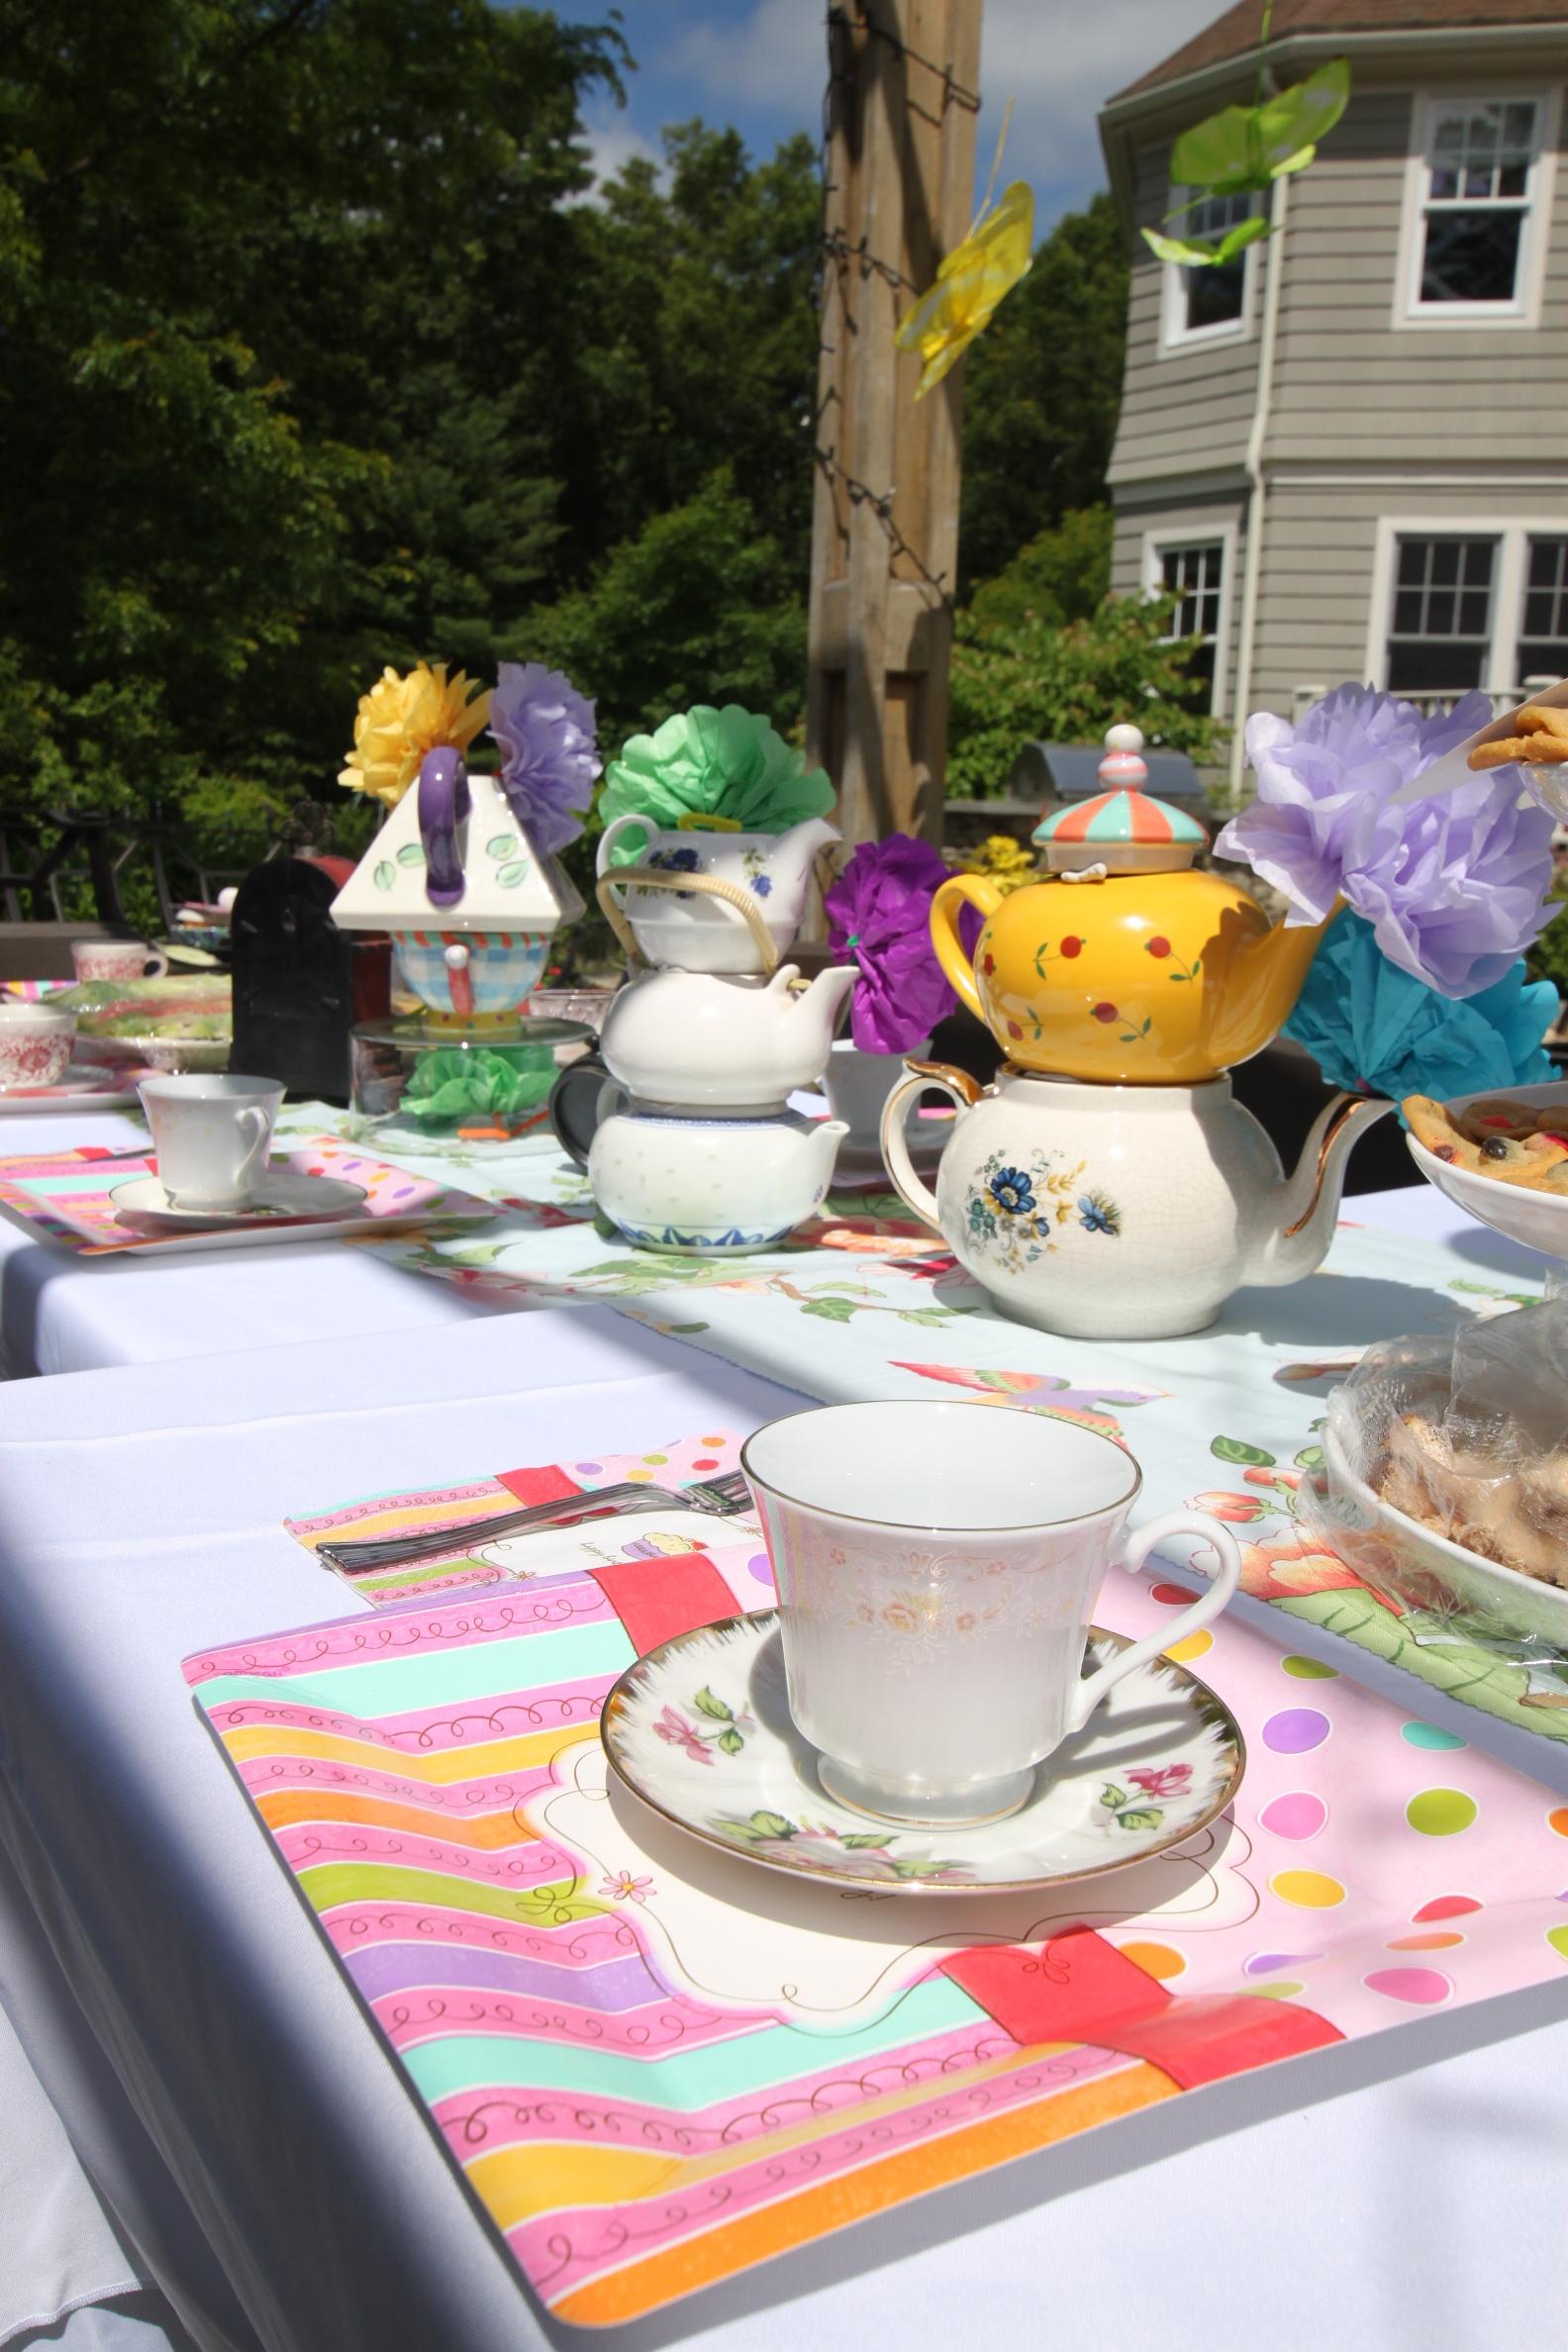 Alice in wonderland, decorations, silly sally, entertainment, boston, los angeles, decor